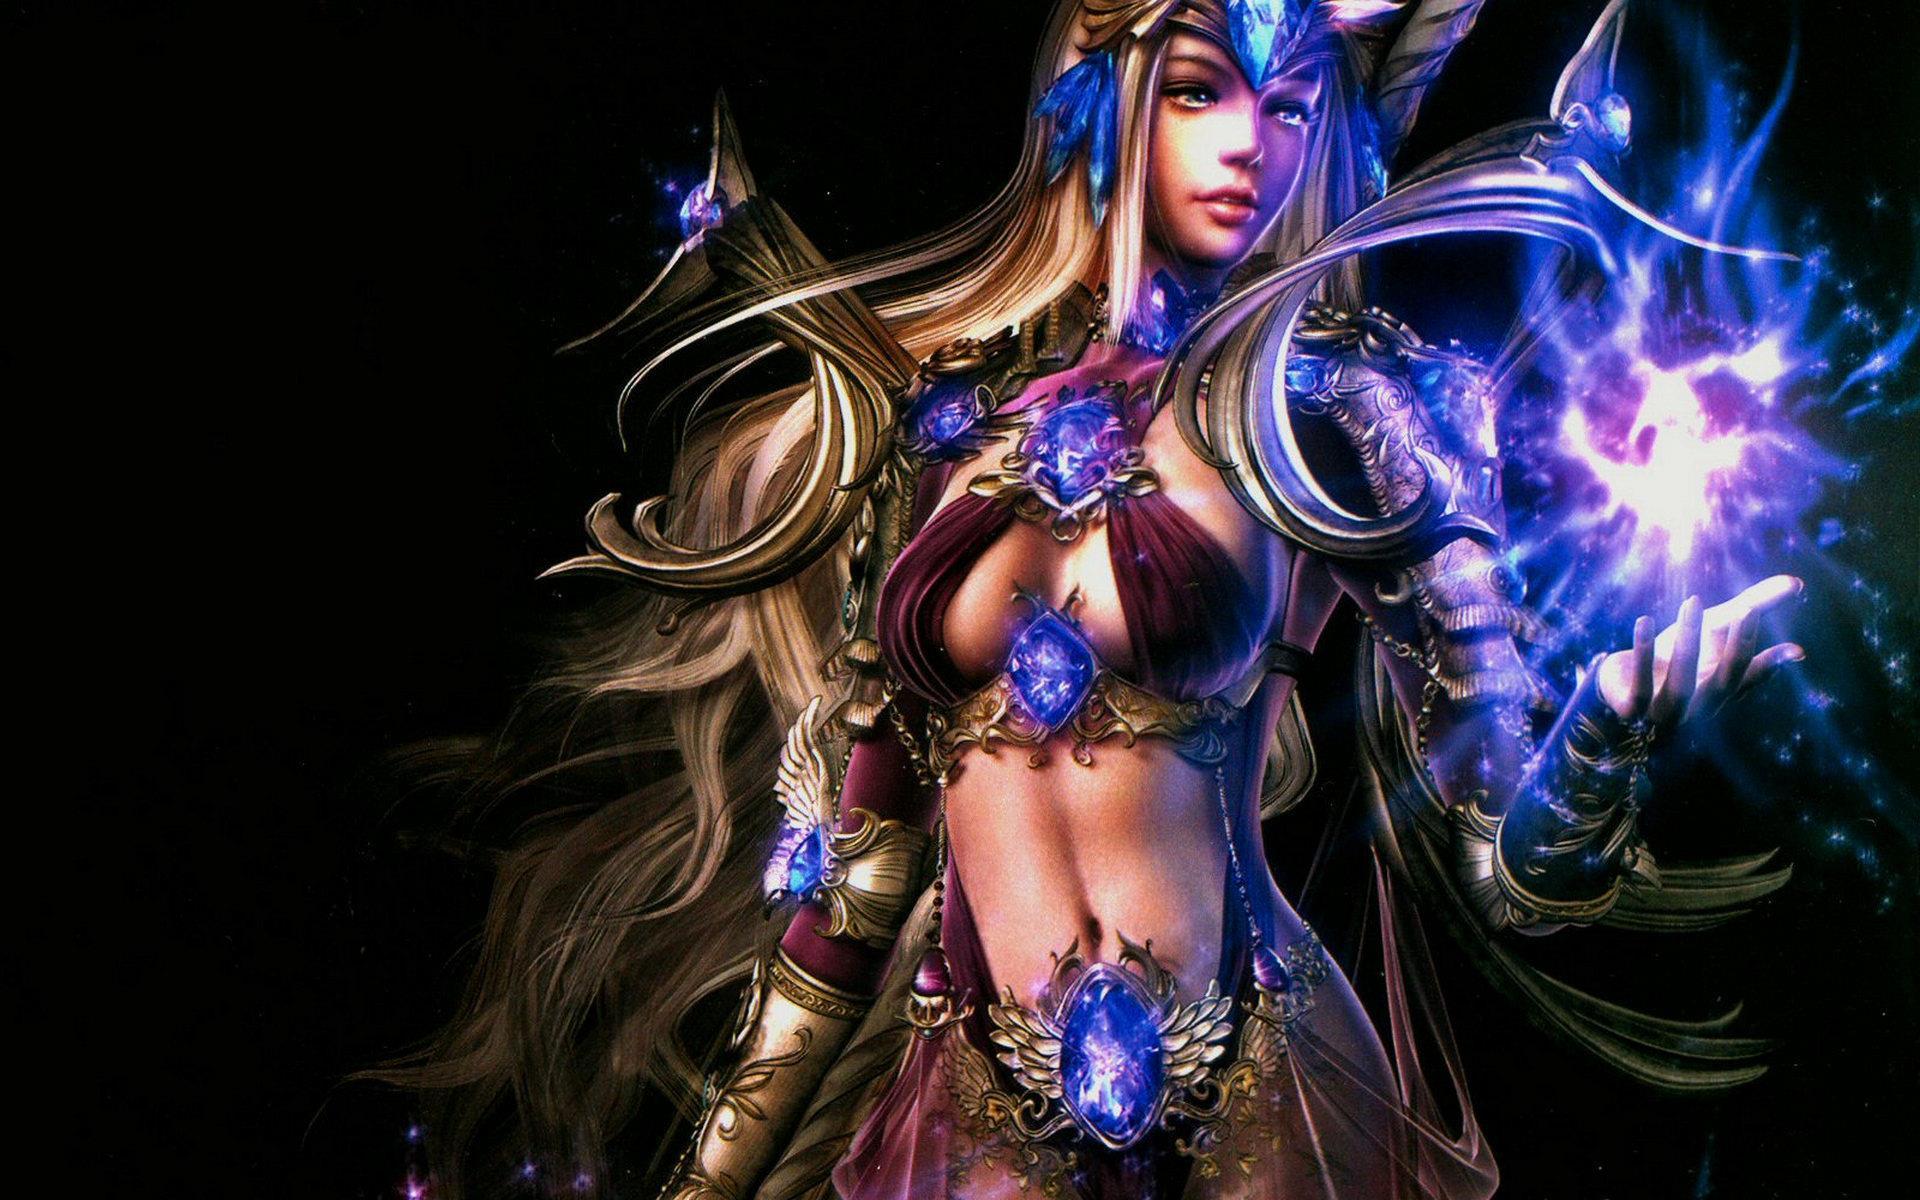 sexy_etrange_mystique_filles-HD_06